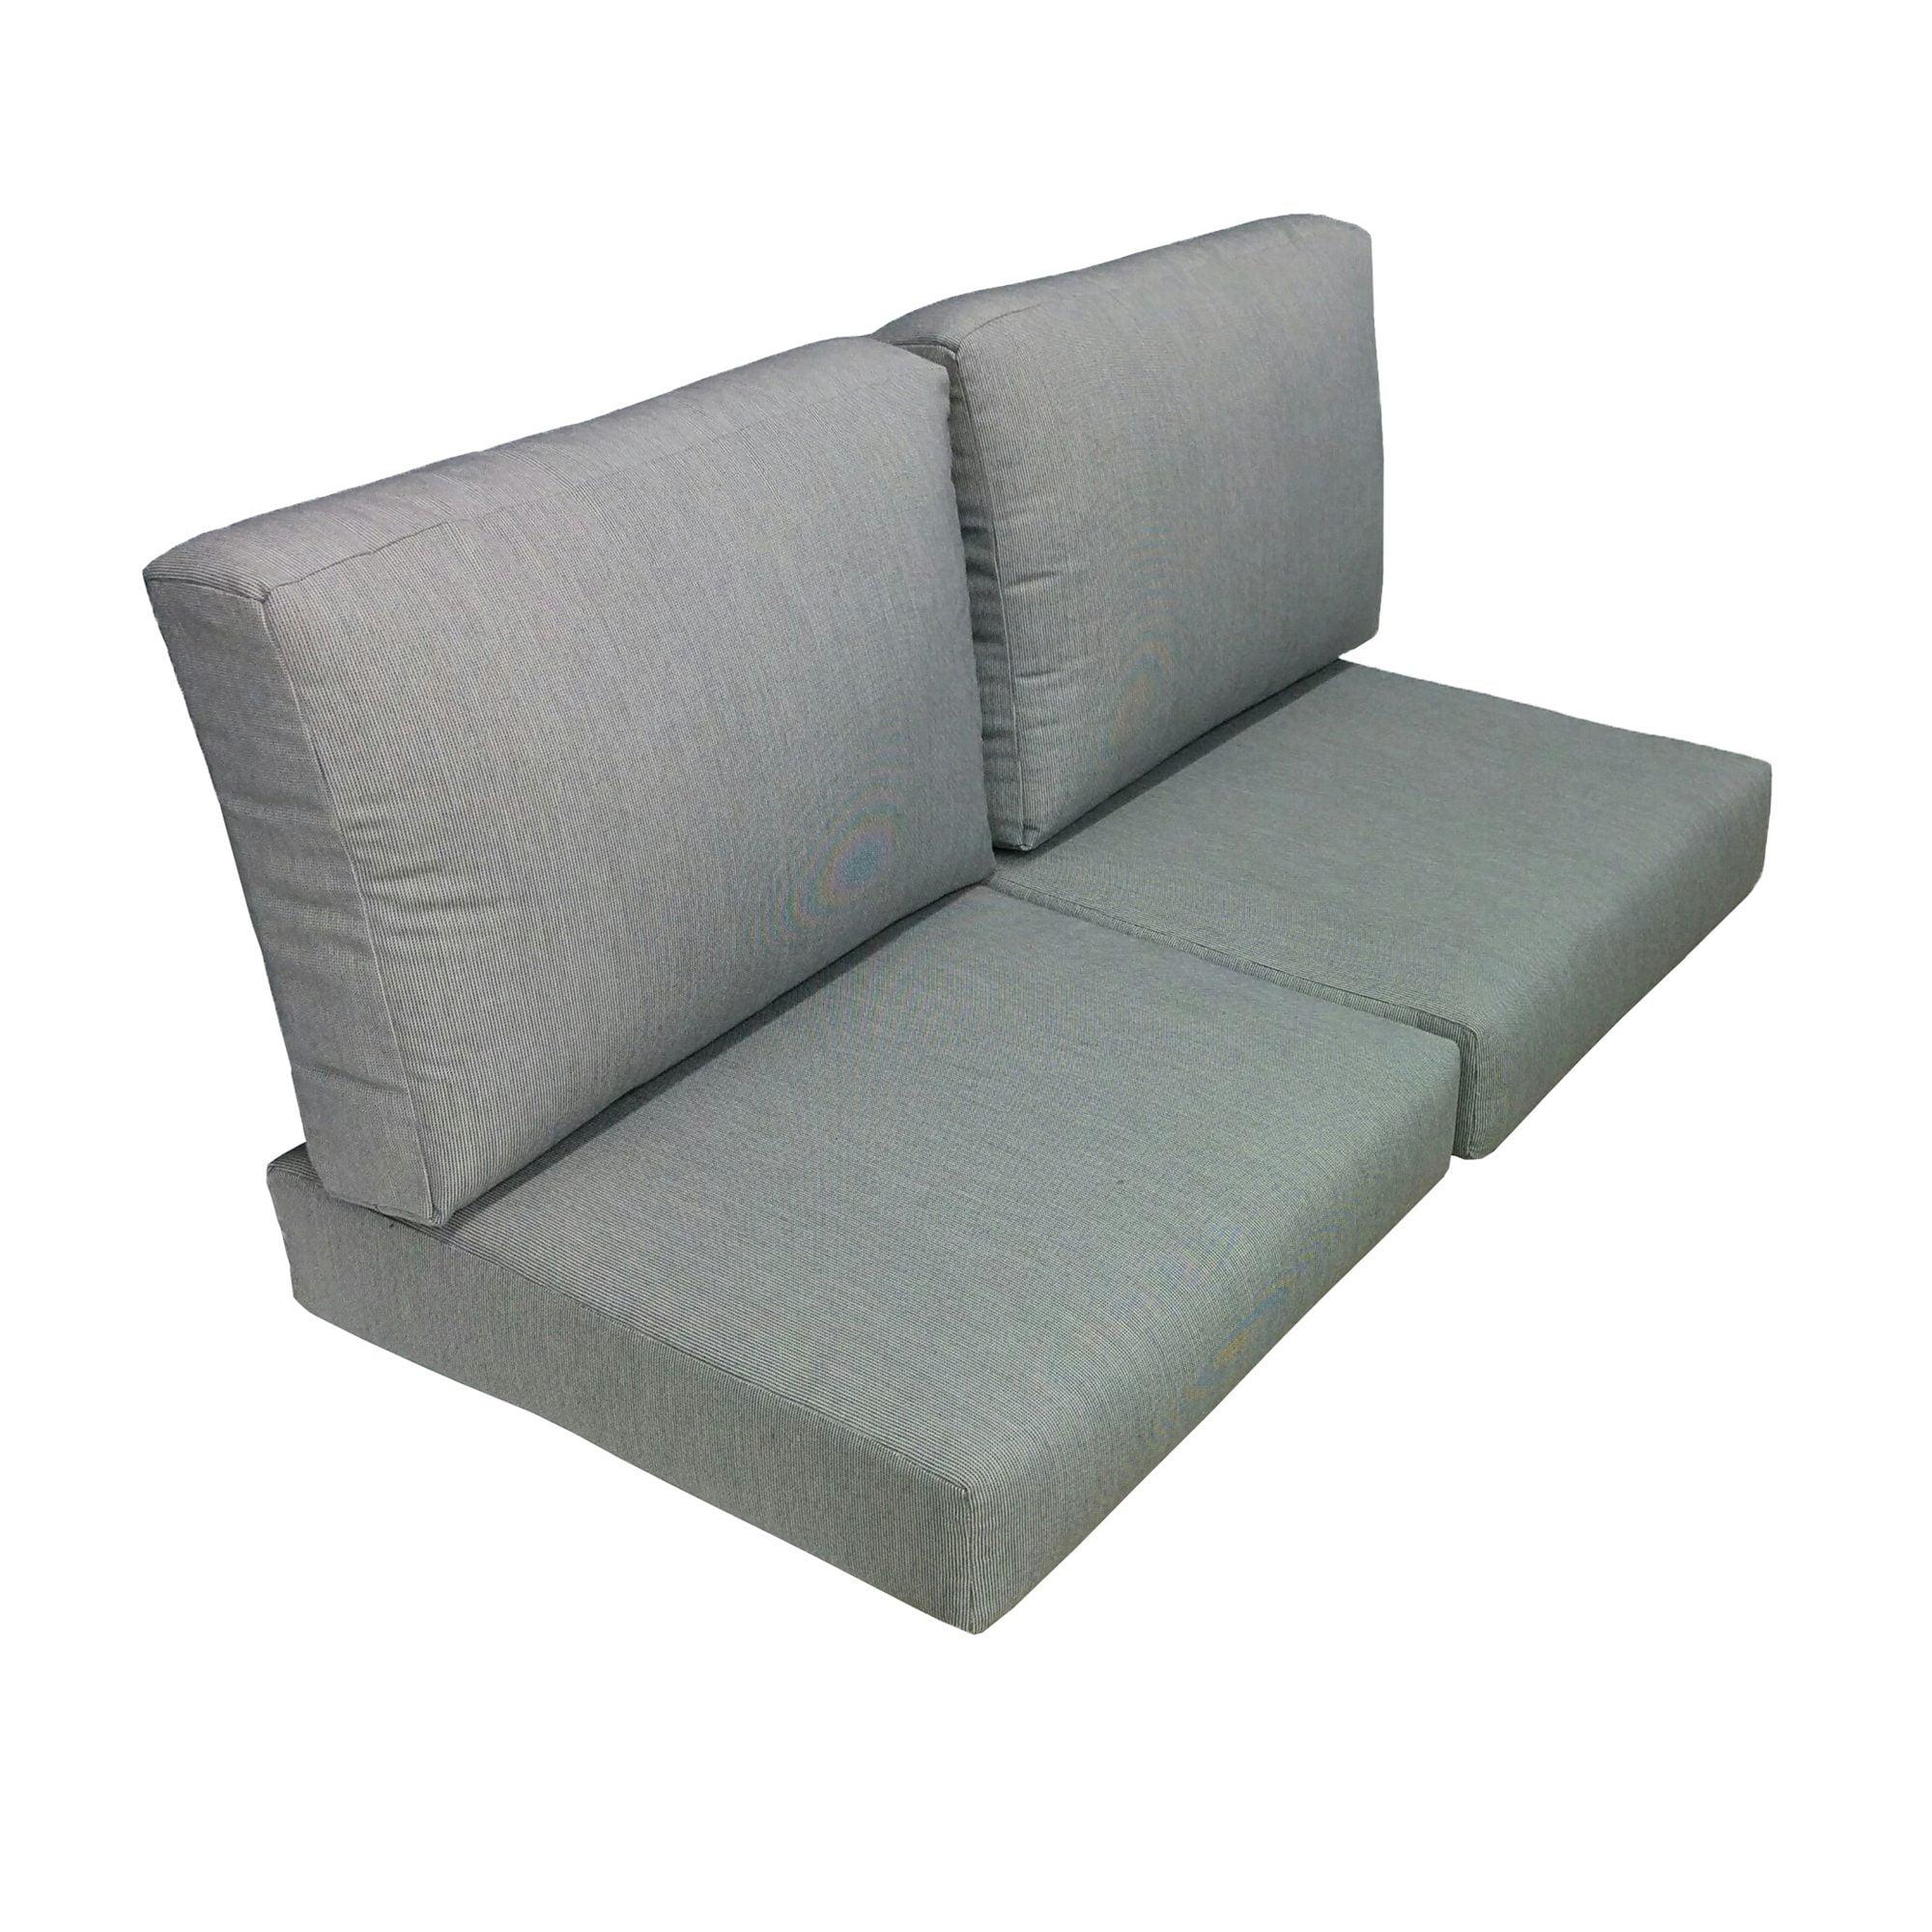 degree cushions products loveseat malibu nci cushion casual